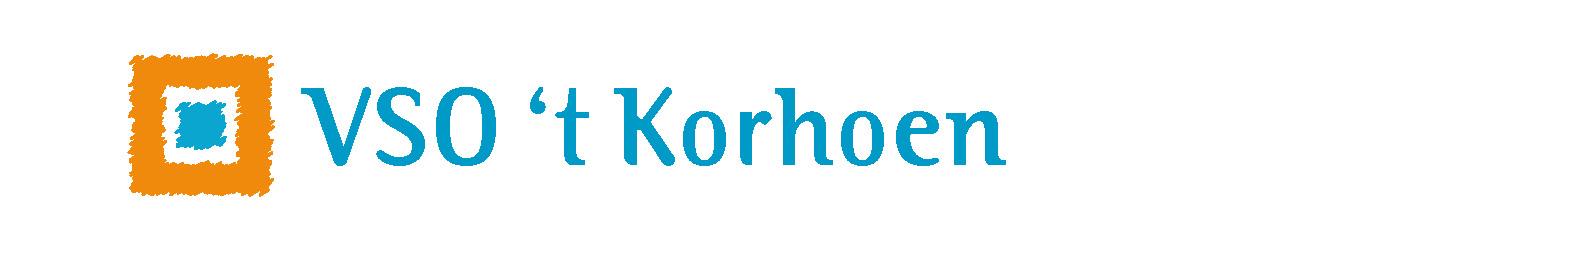 VSO 't Korhoen